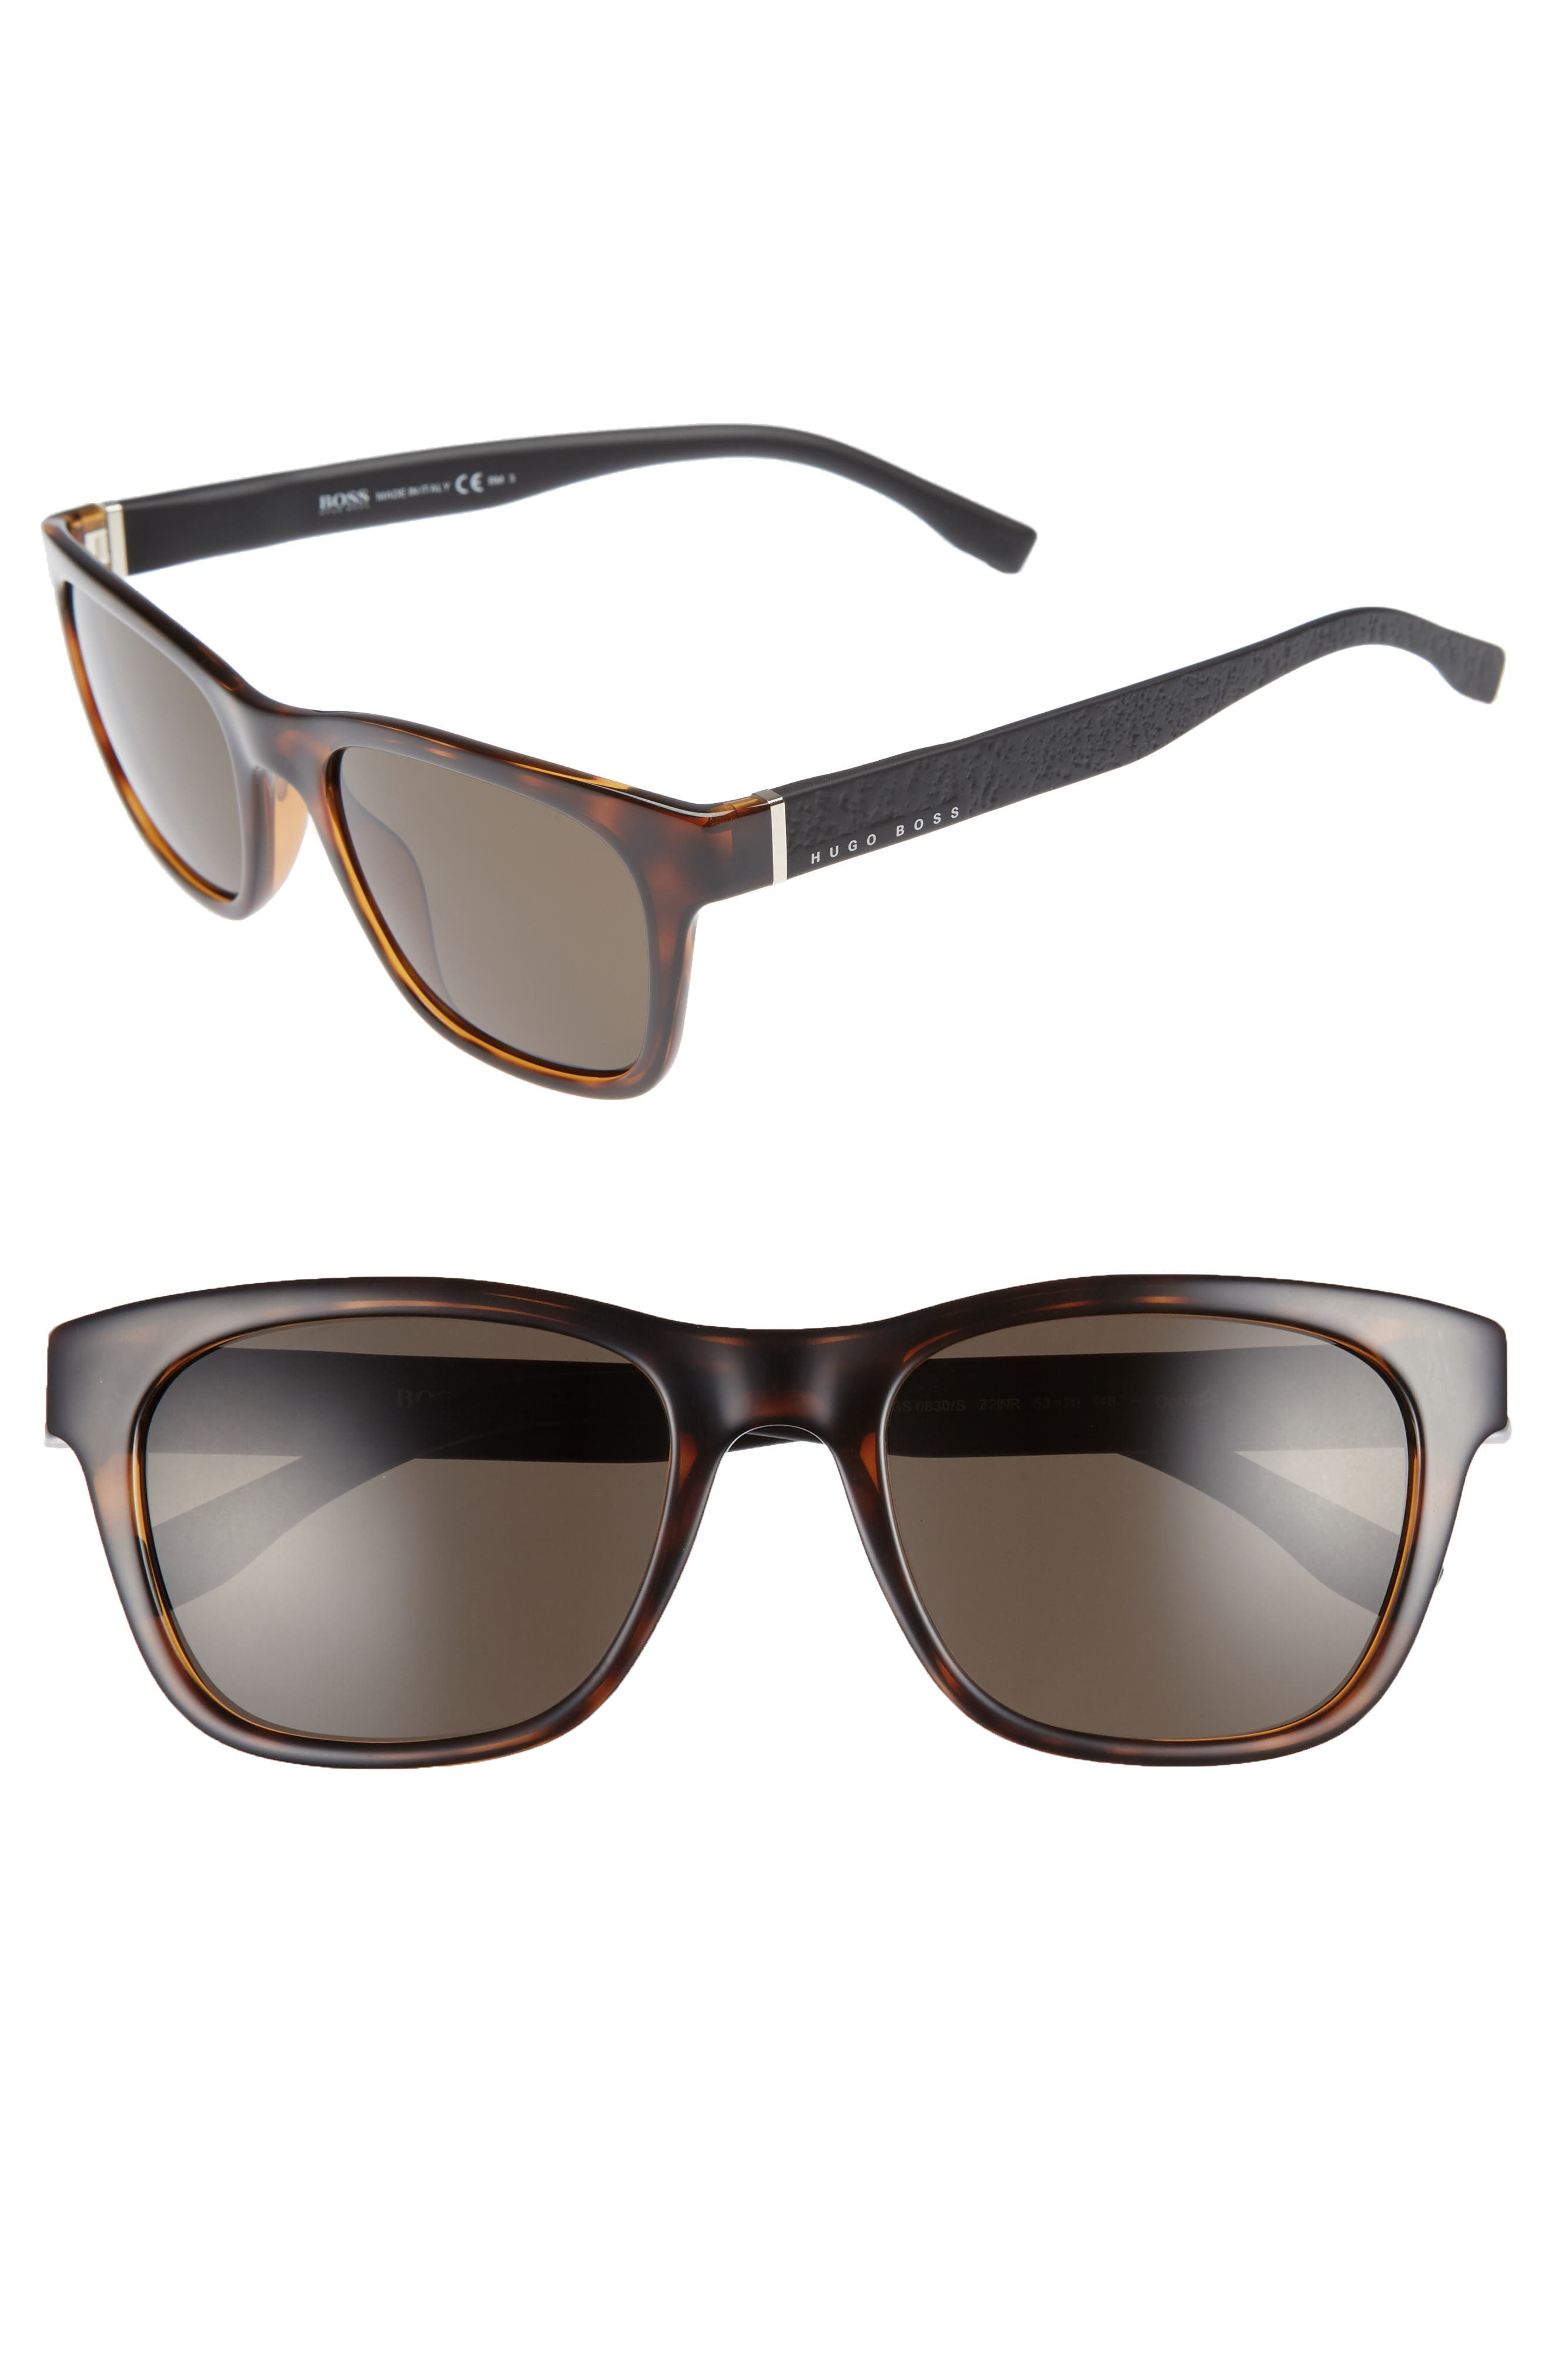 53mm Polarized Sunglasses,                         Main,                         color, HAVANA BLACK/ BROWN GREY